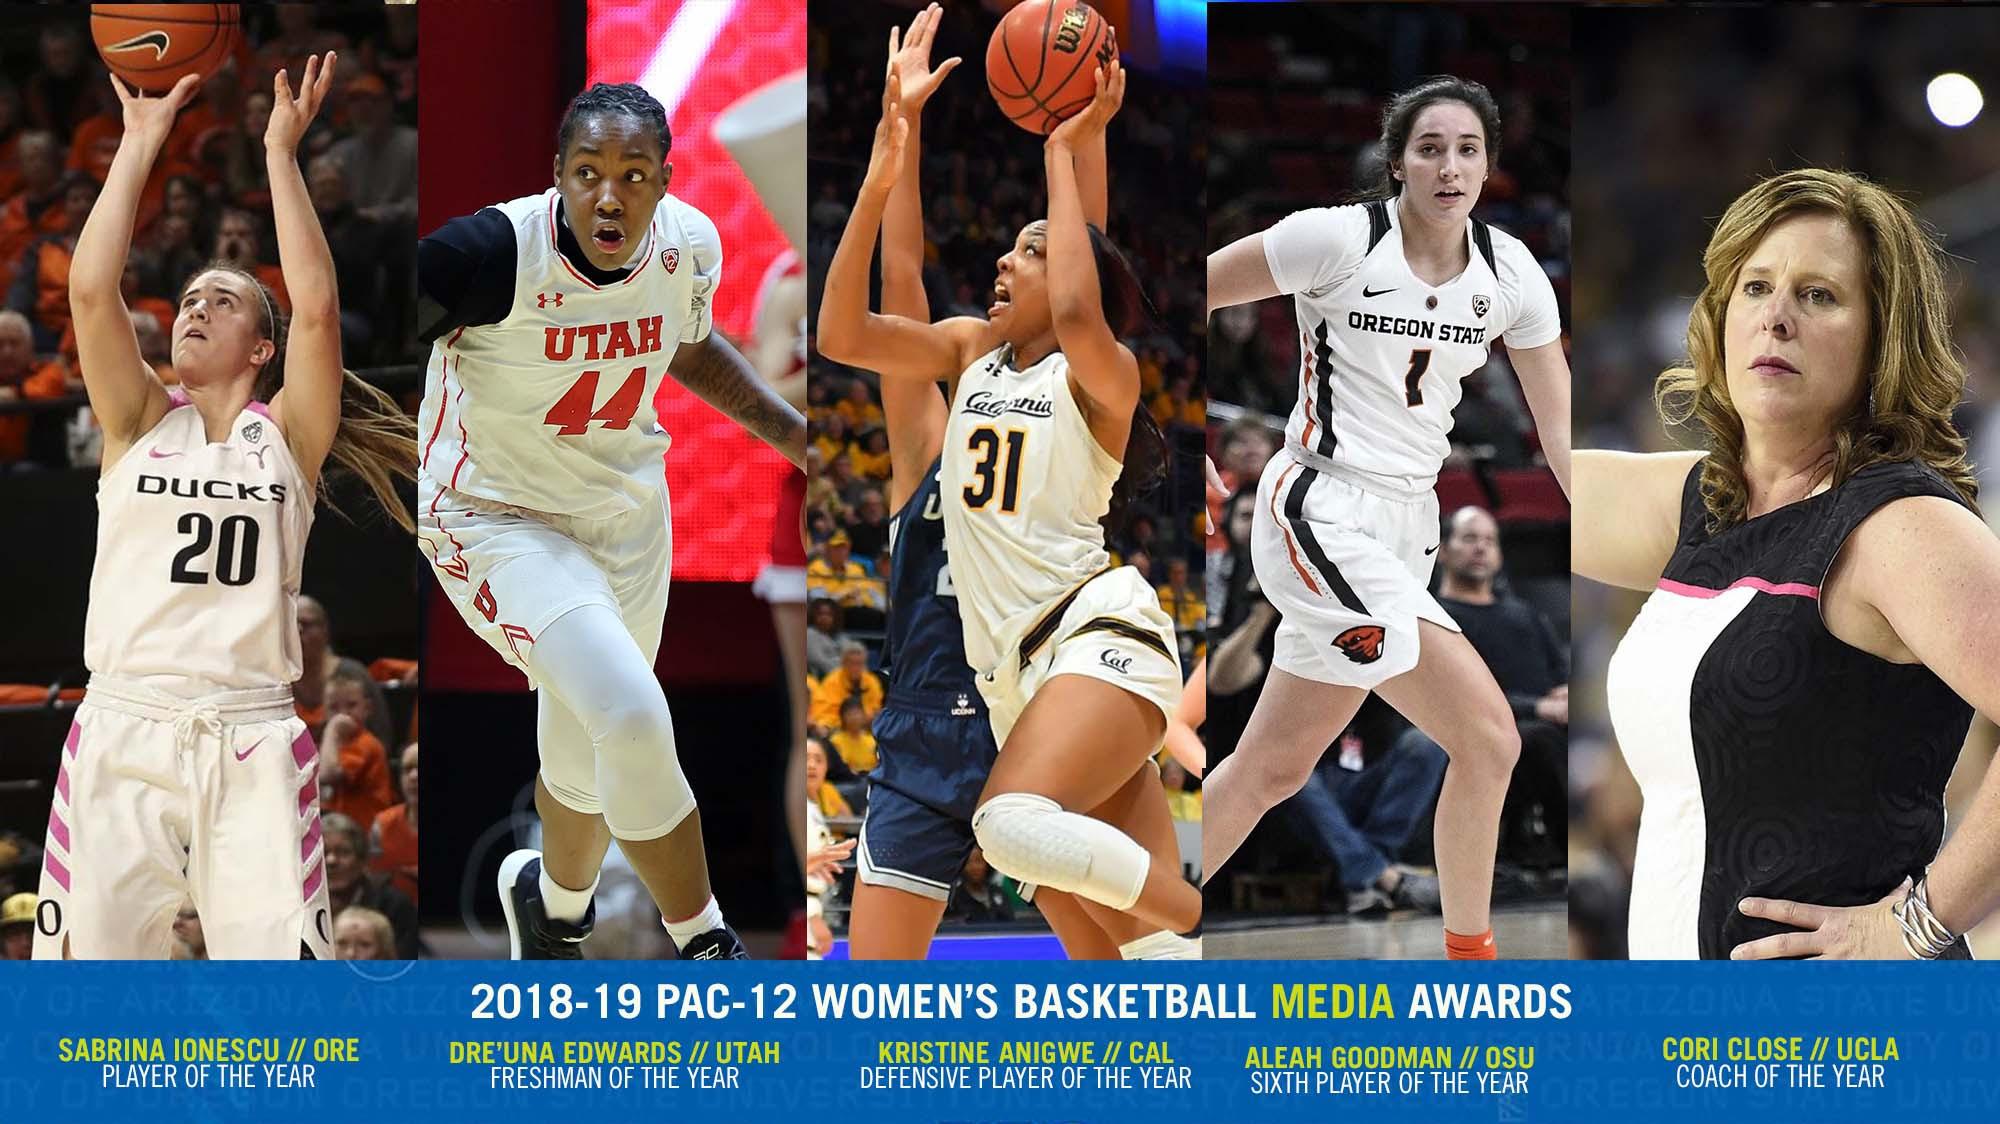 Pac-12 Postseason Awards announced: Media tab UCLA's Cori Close as Coach of the Year